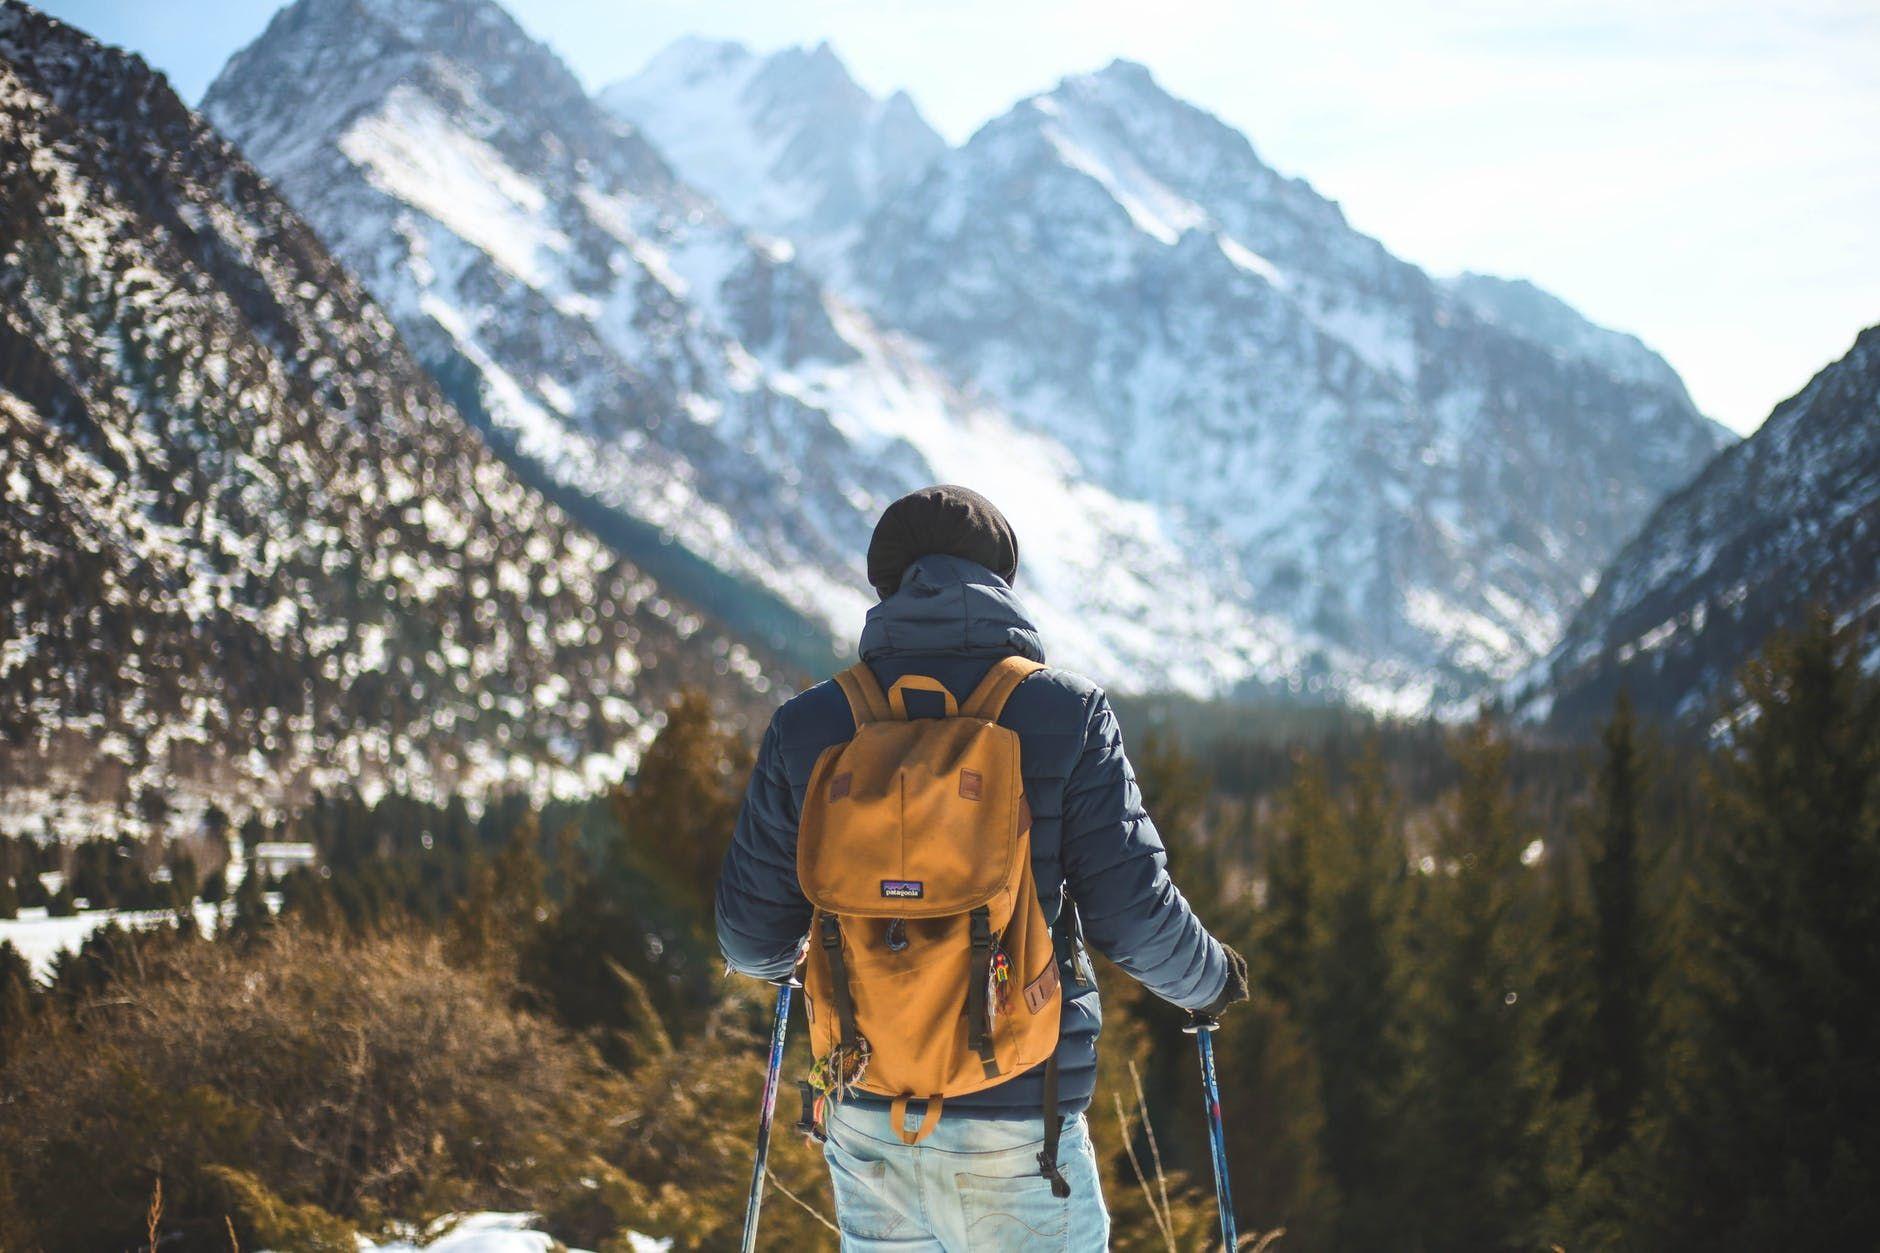 jangan-sembarangan-berikut-gejala-hipotermia-di-gunung